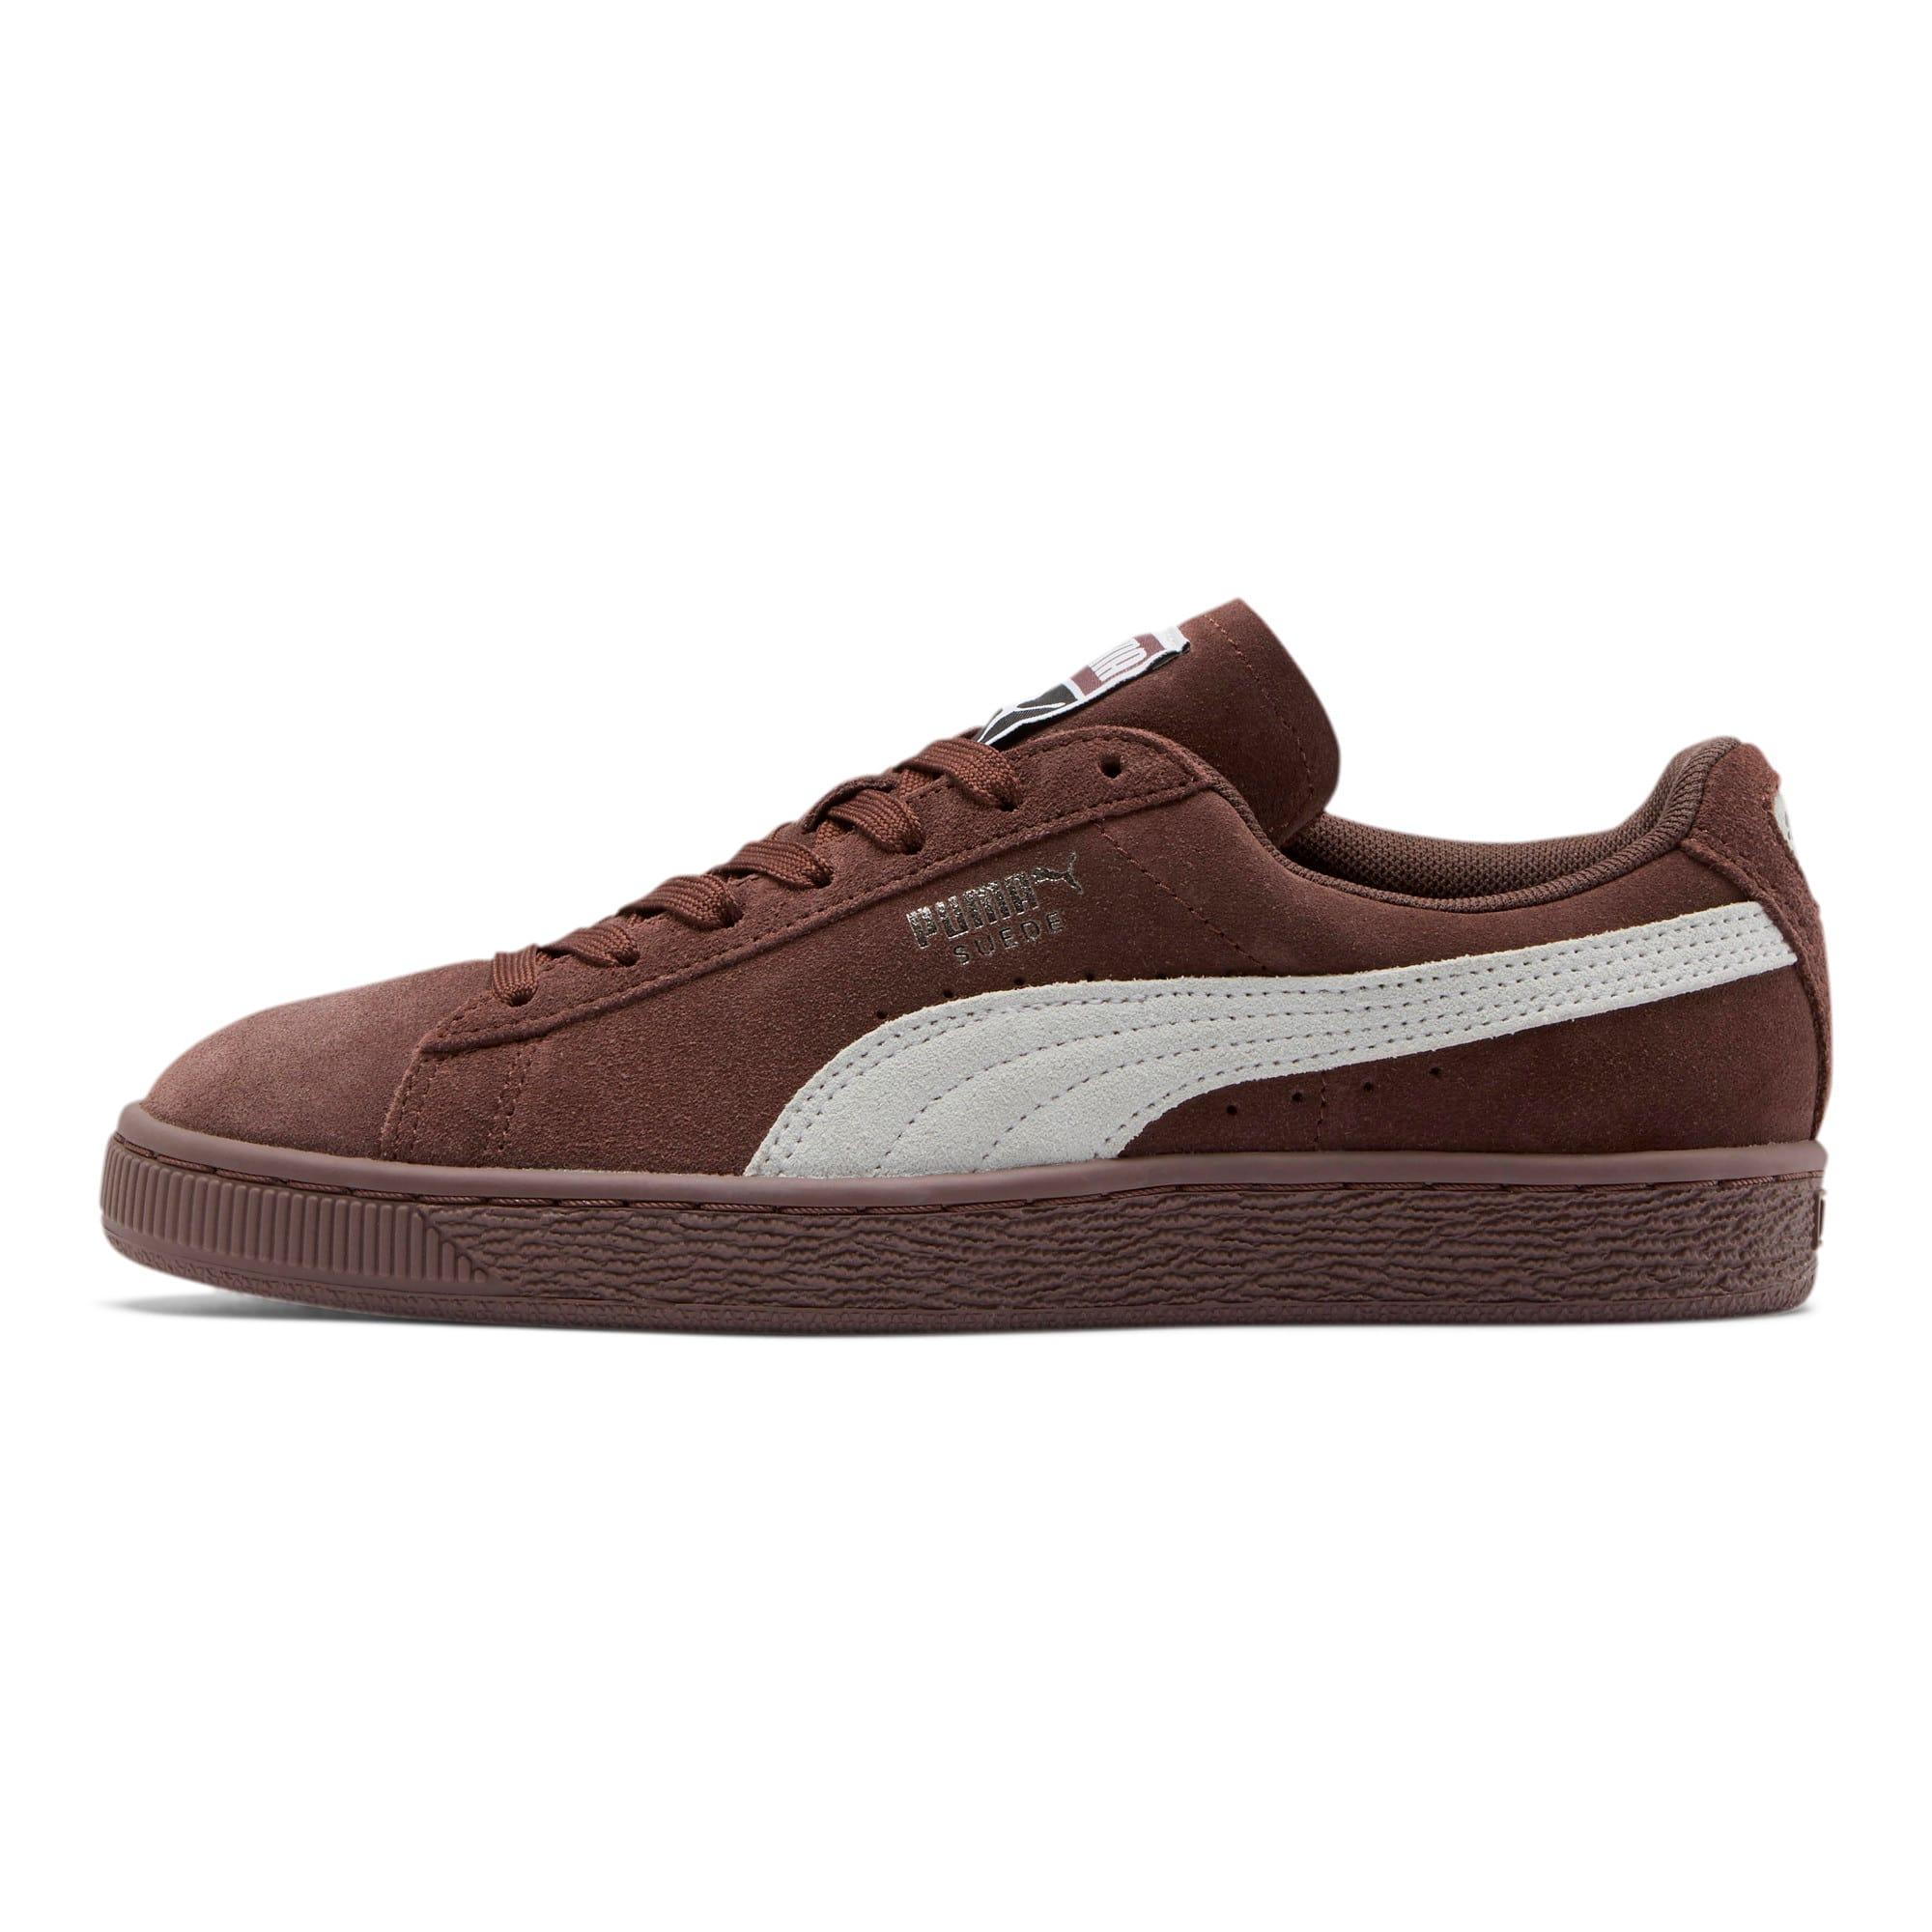 Thumbnail 1 of Suede Classic Women's Sneakers, Peppercorn-Puma White, medium